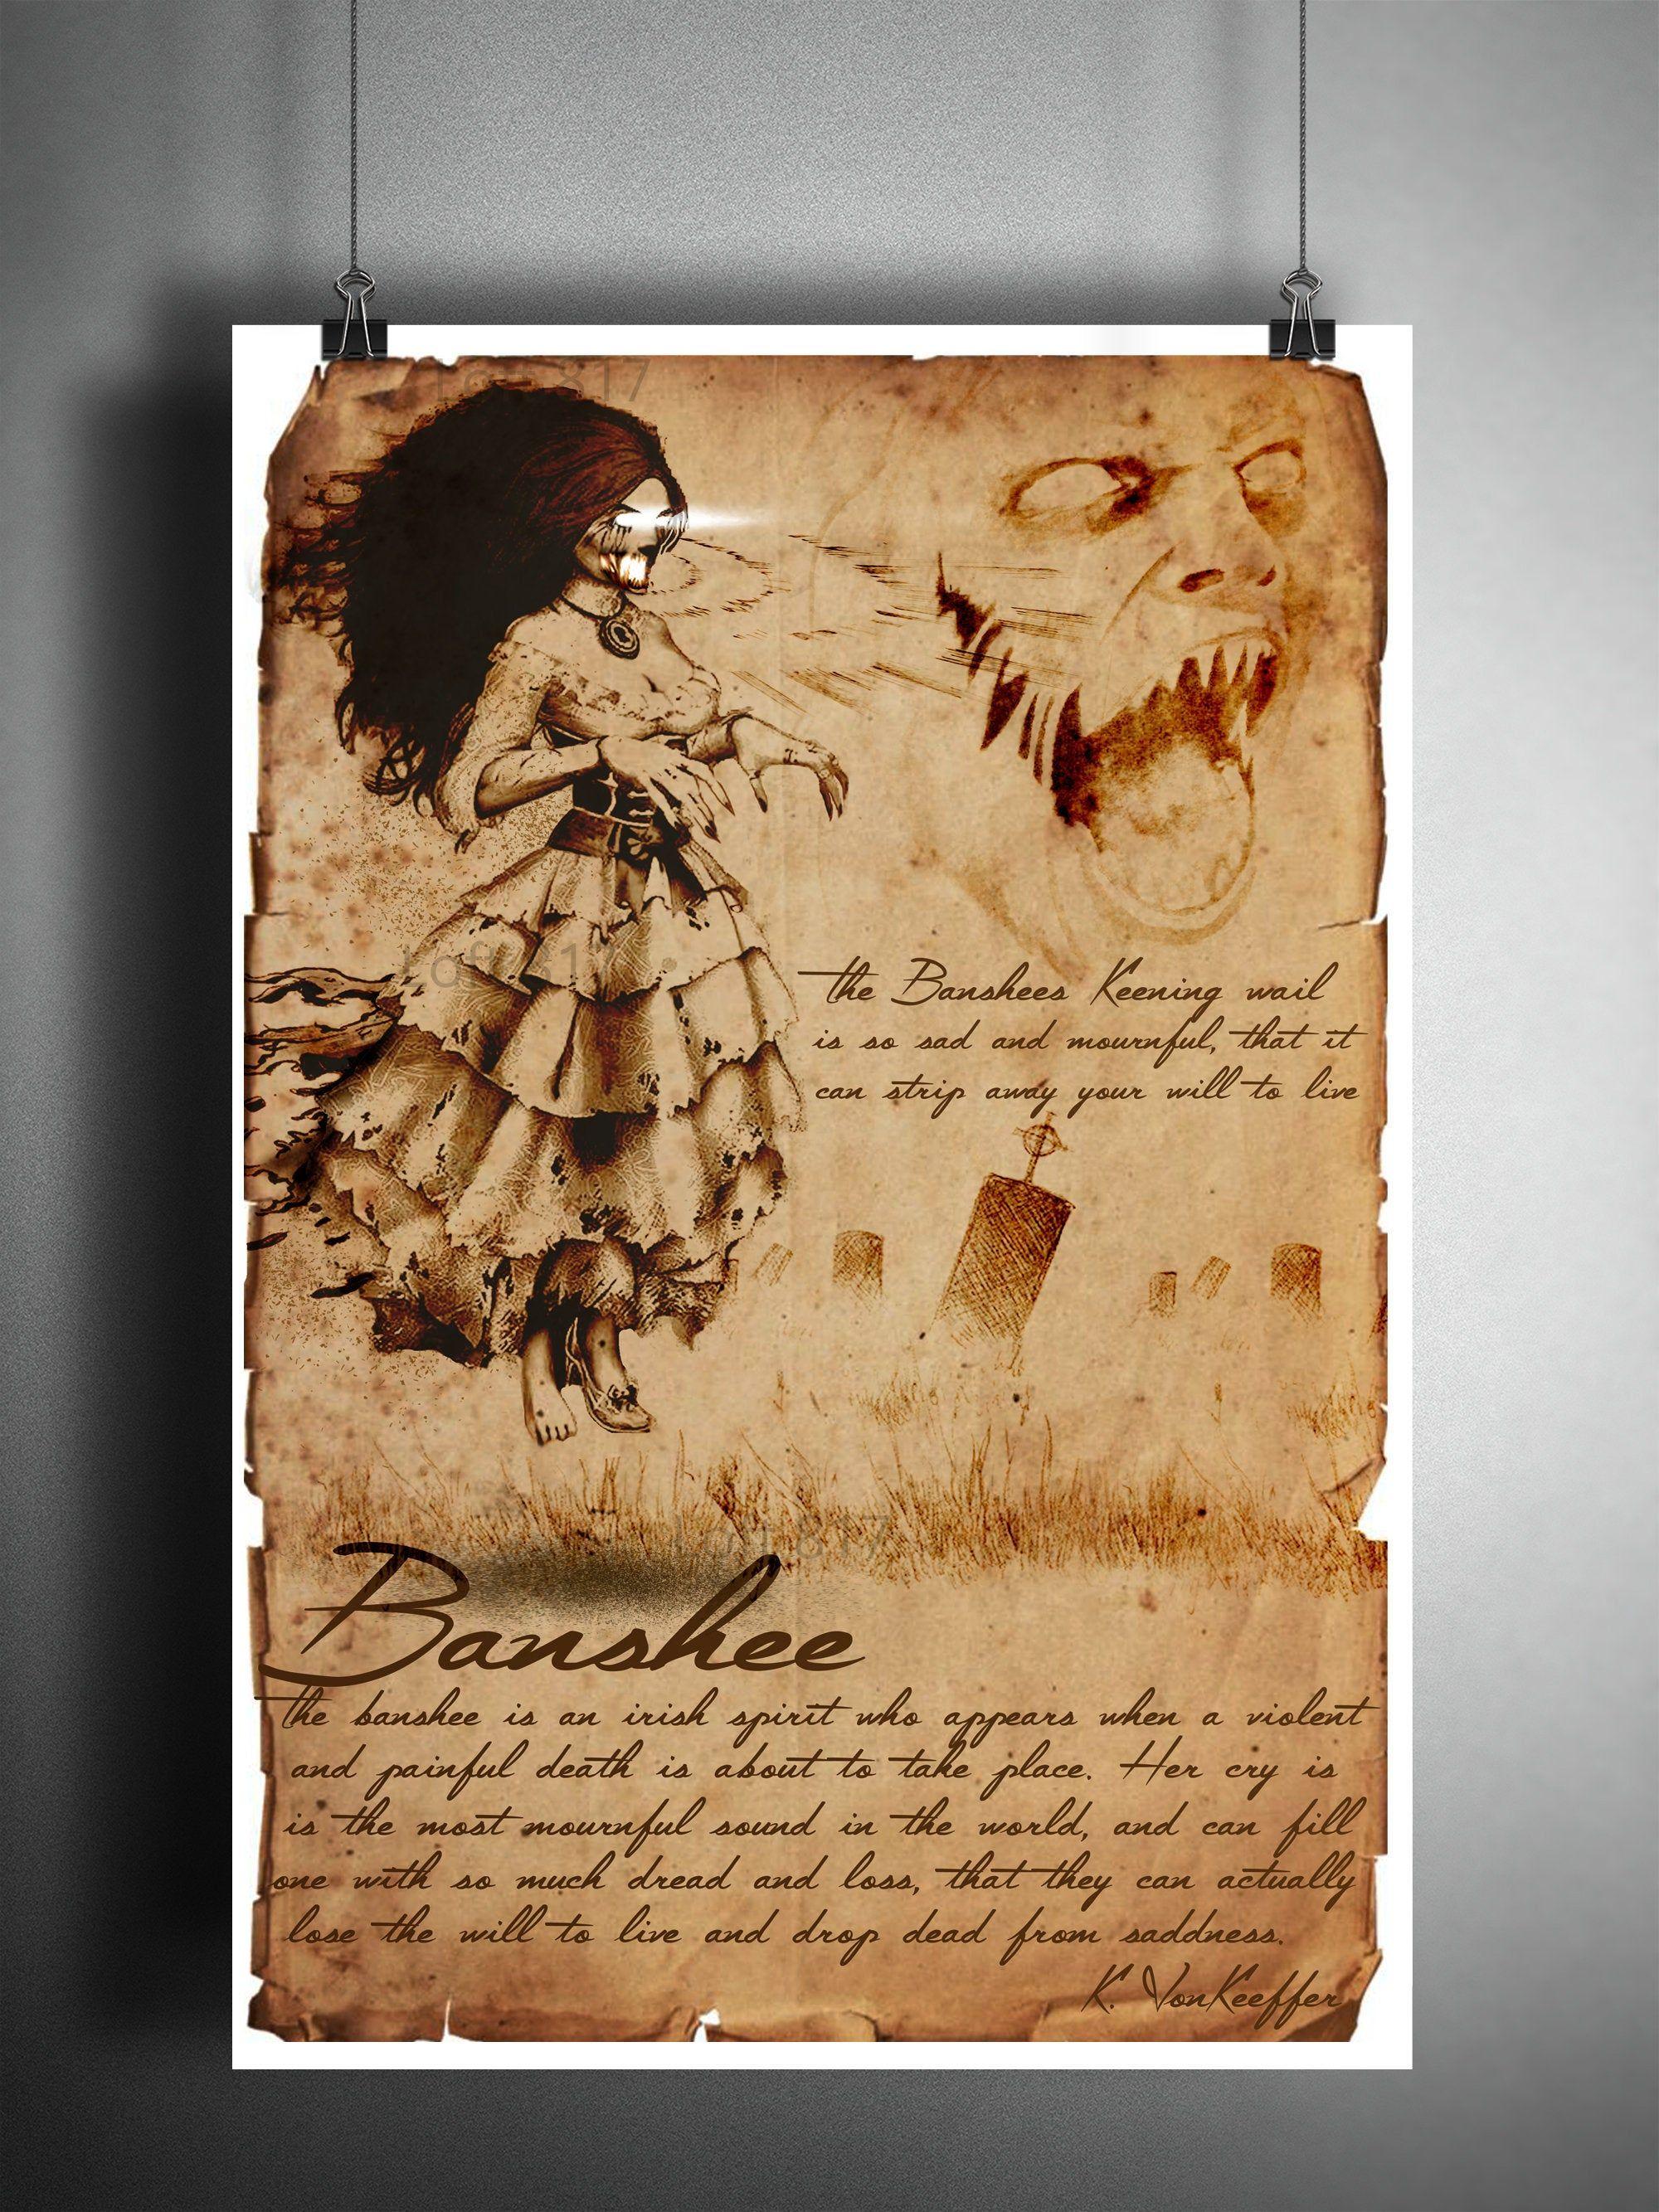 Banshee spirit art sketch, field guide, bestiary art, myths and monsters, creepy art, folklore art